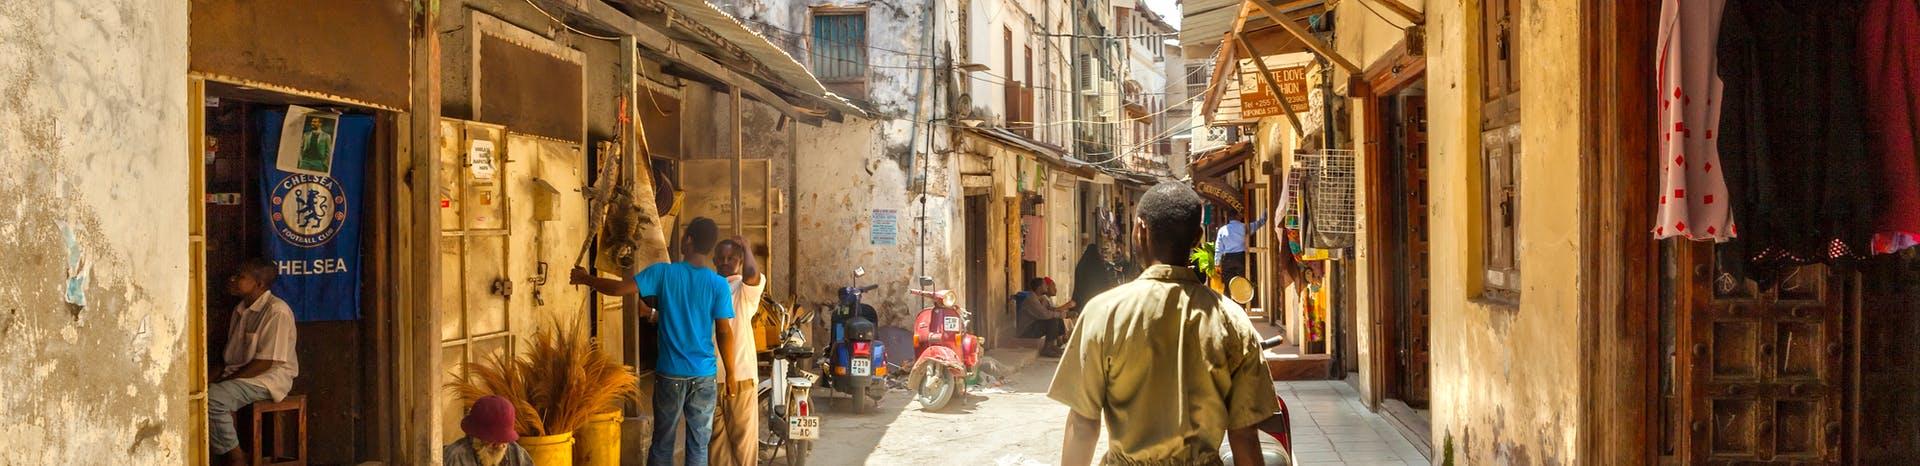 Picture of Dar es salaam